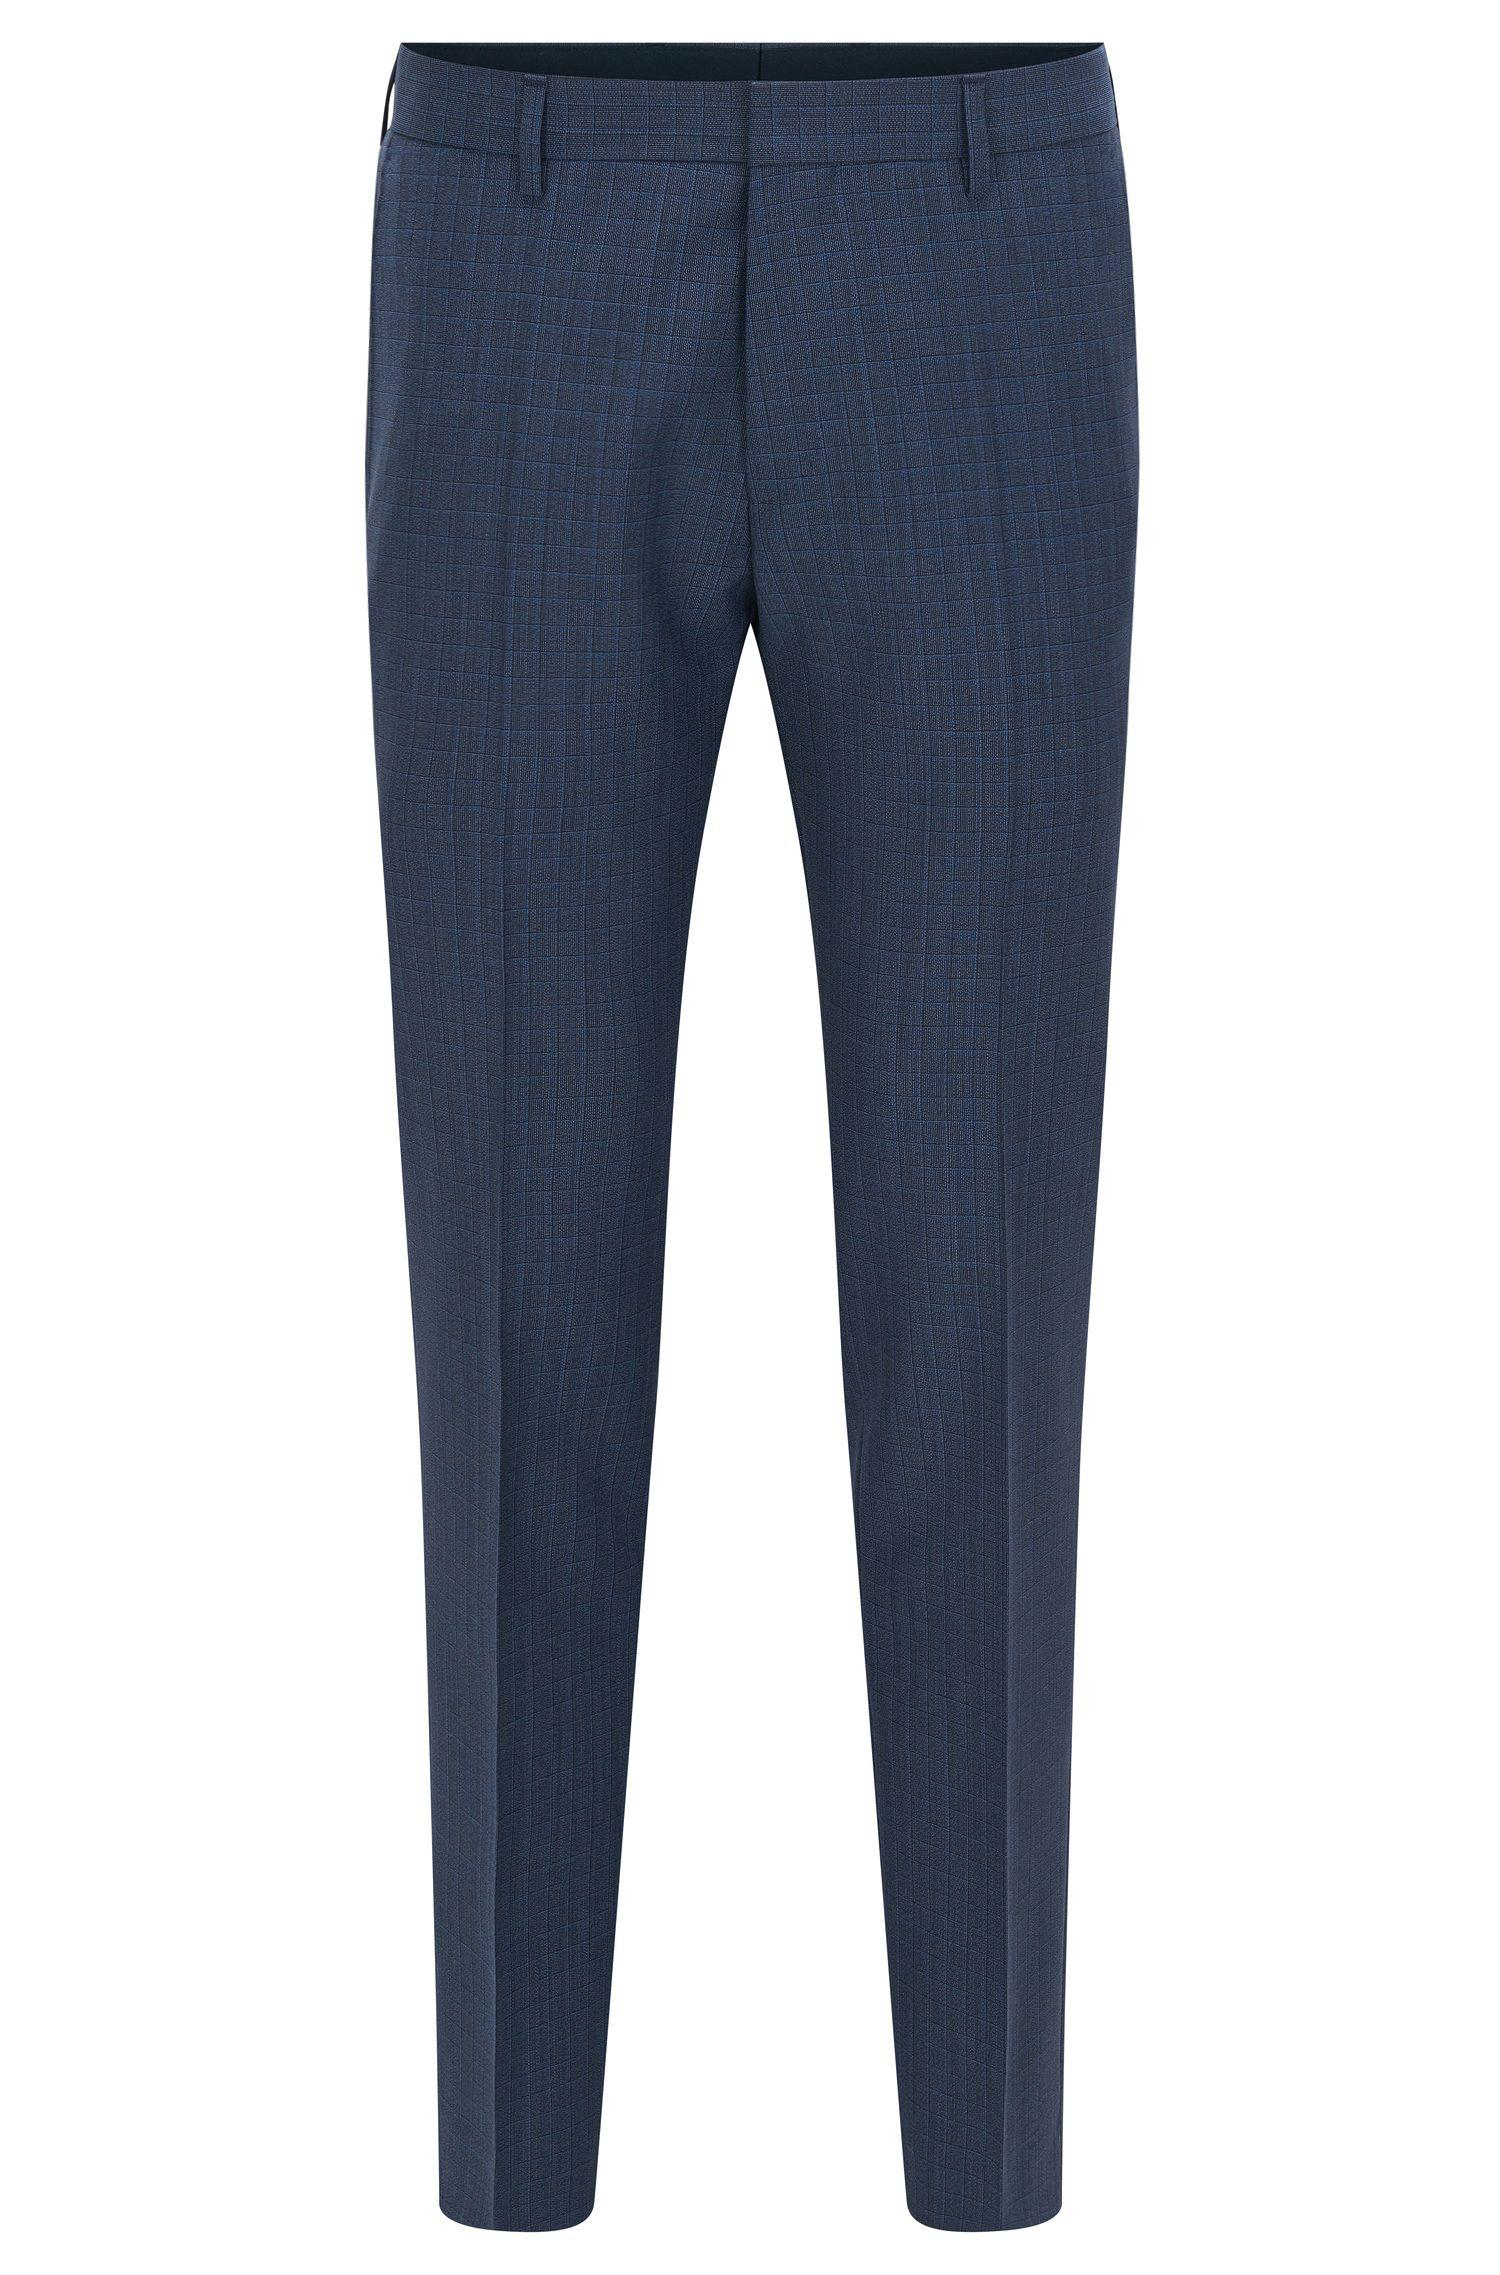 Pantaloni slim fit in lana vergine a quadri